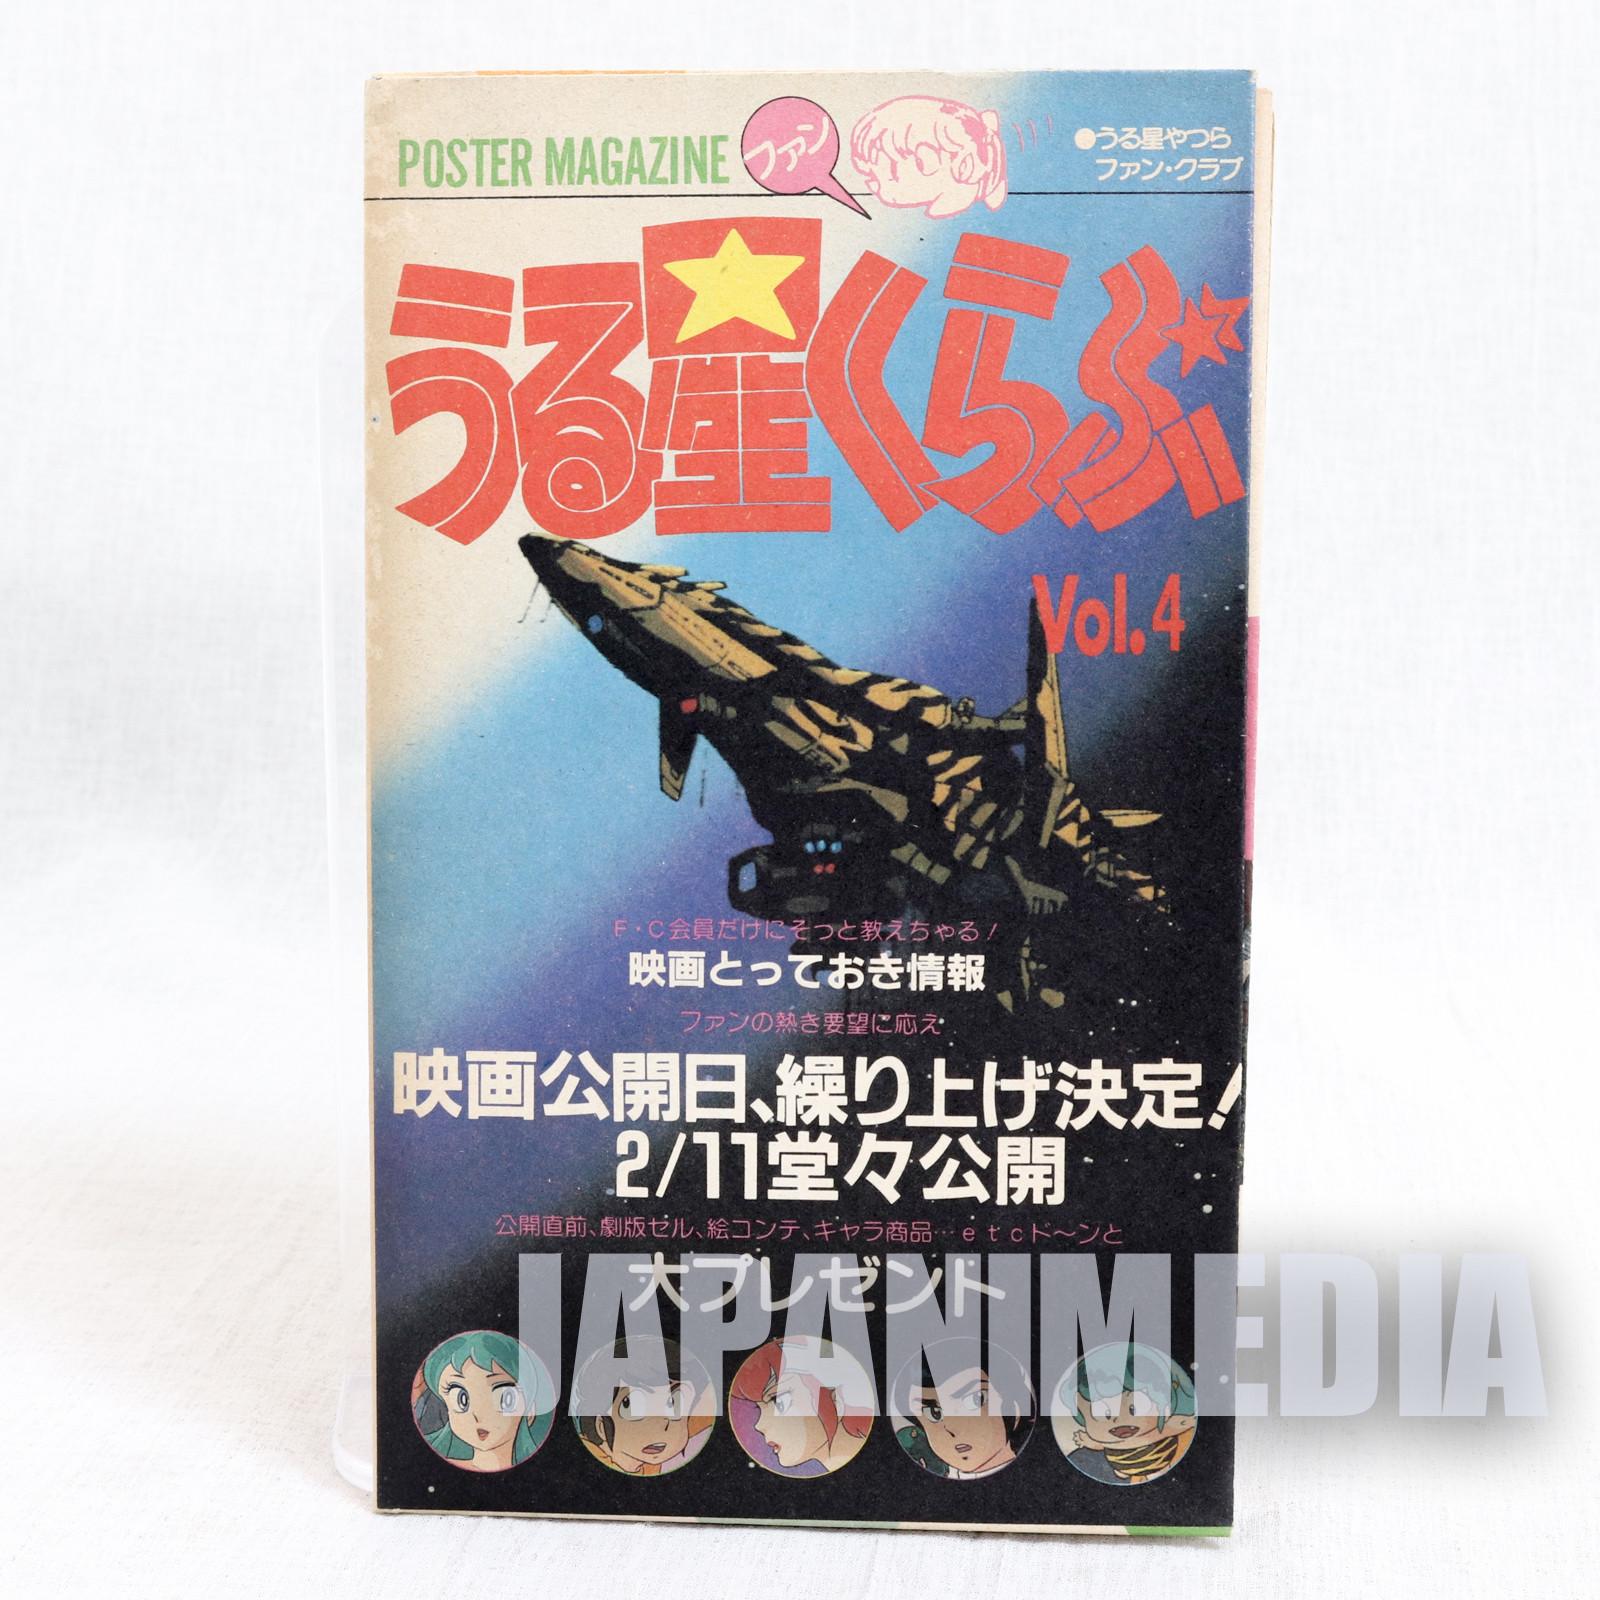 Urusei Yatsura Official Fan Club Poster Magazine Vol.04